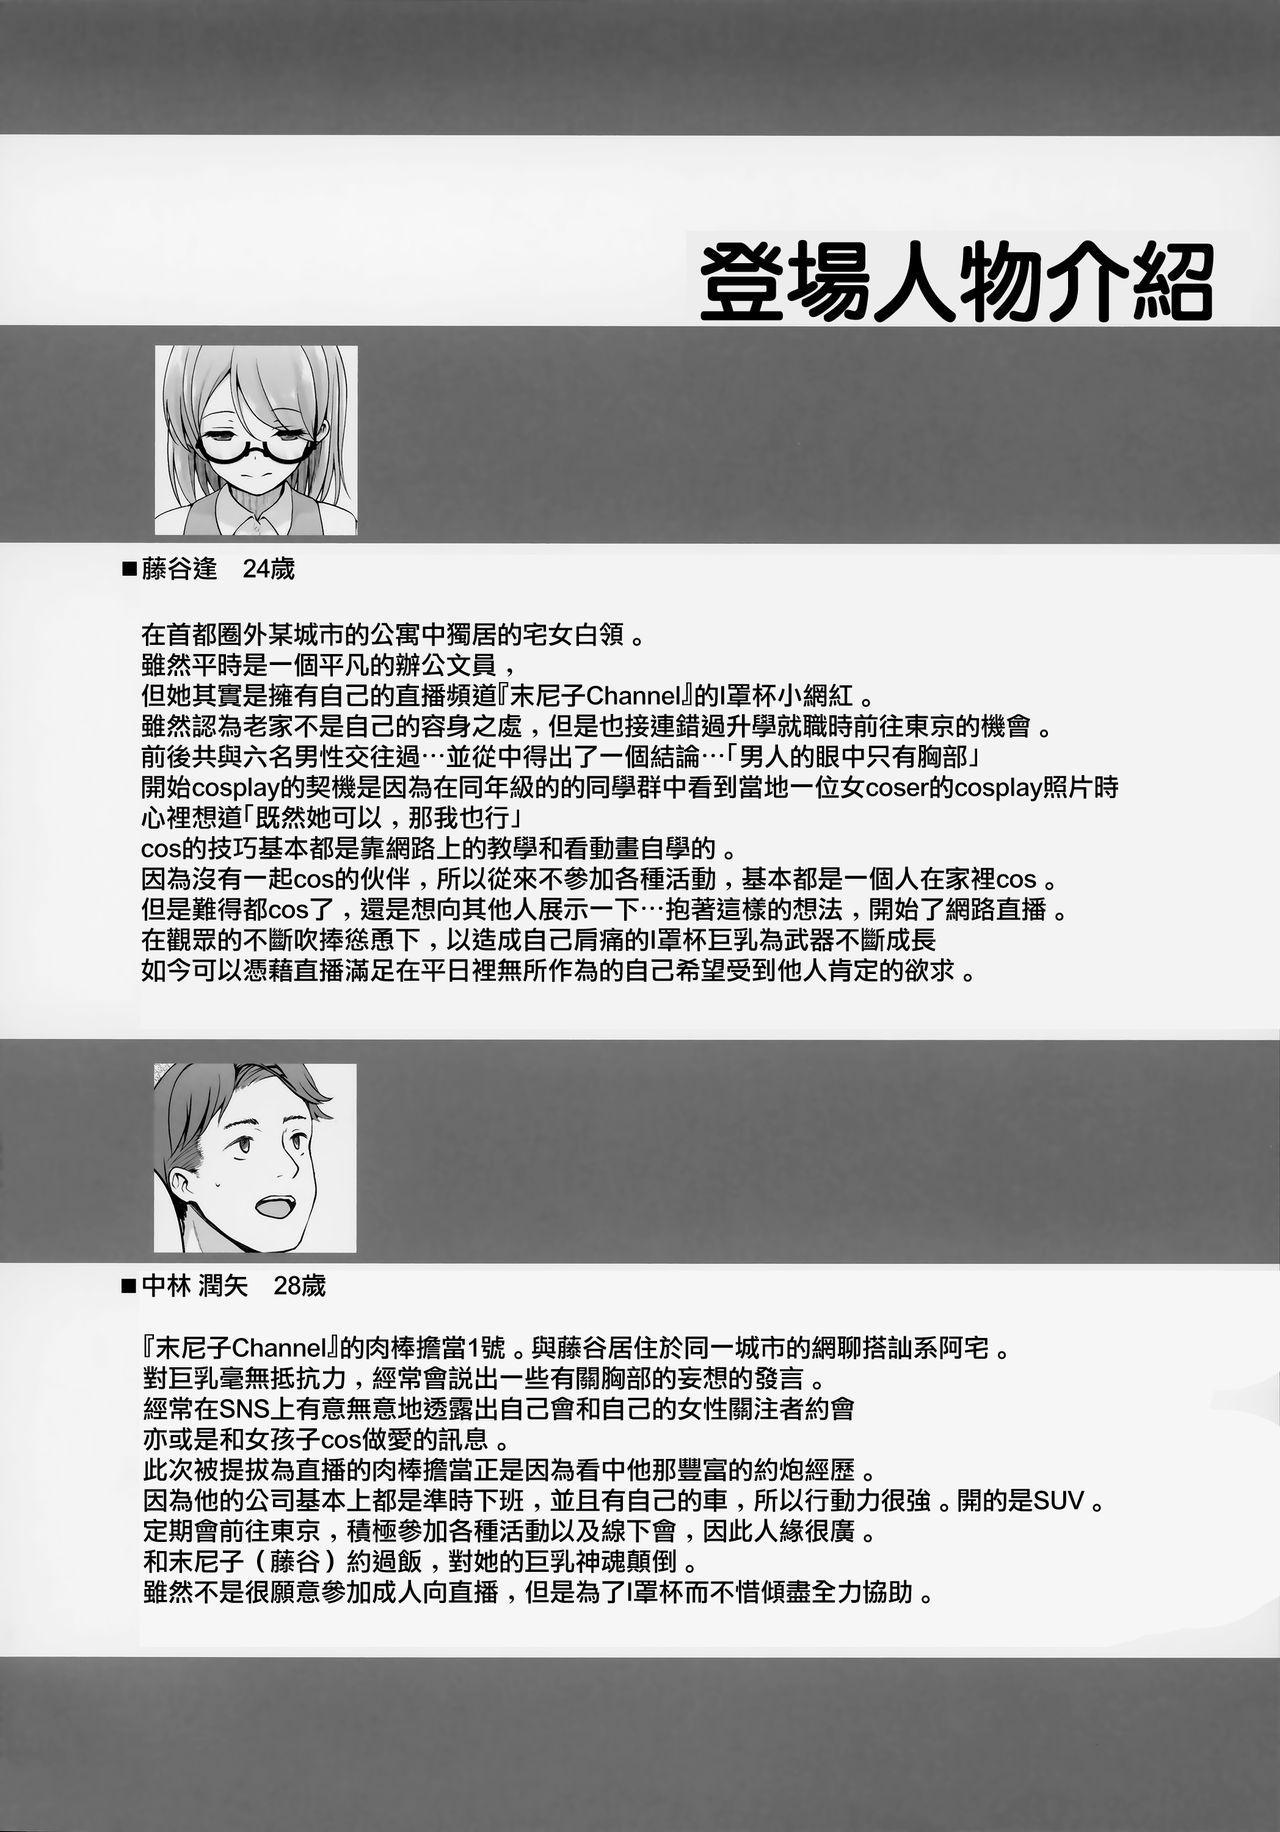 I-Cup Uraaka Shirouto Haishinsha Cosplay Namahame 2